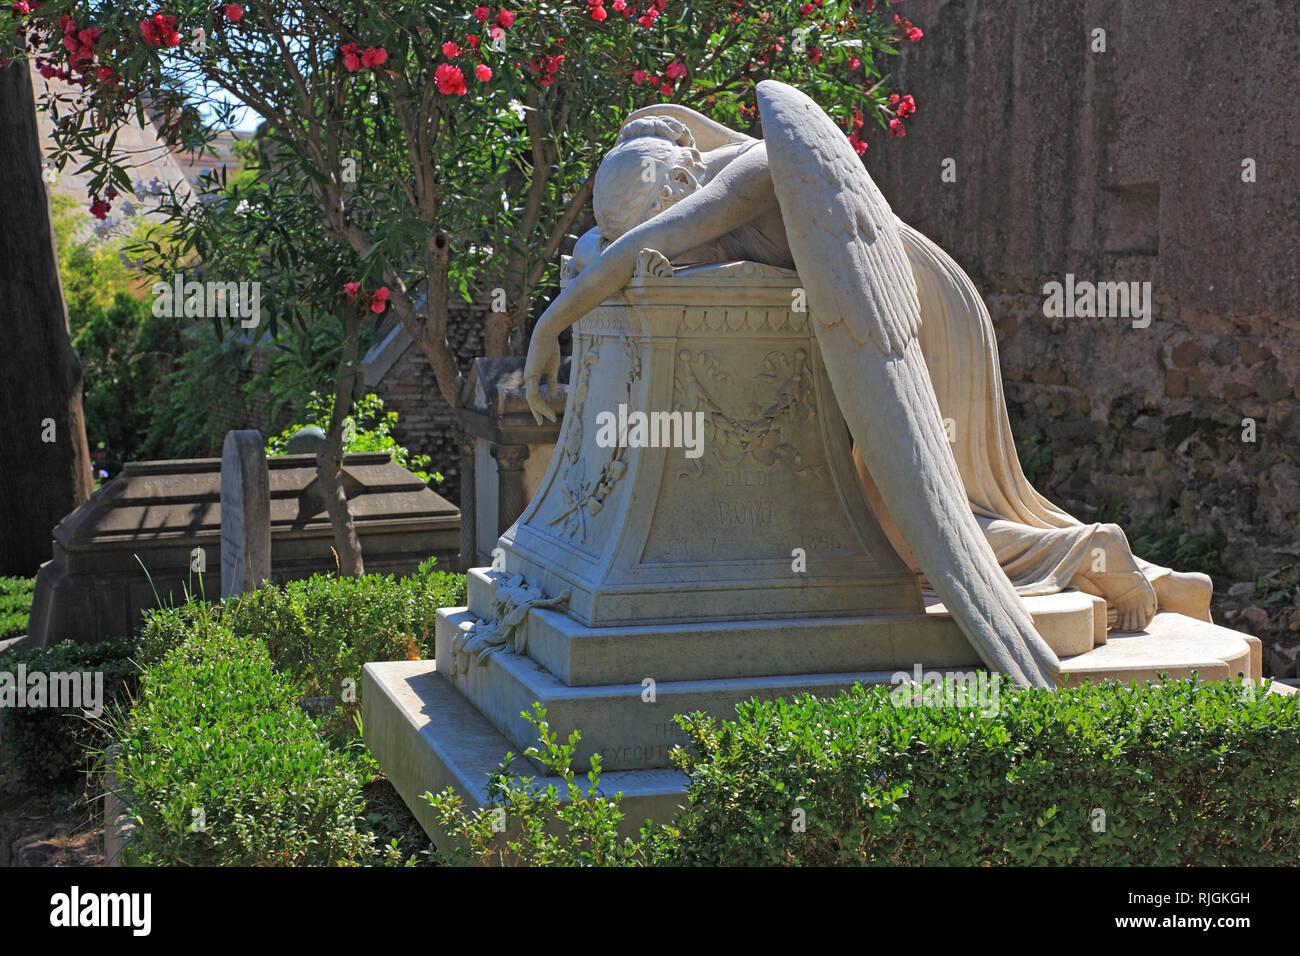 Angel of Grief, the grave of  William Wetmore Story, The Cimitero Acattolico, Non-Catholic Cemetery of Rome, Cimitero dei protestanti, Protestant Ceme - Stock Image